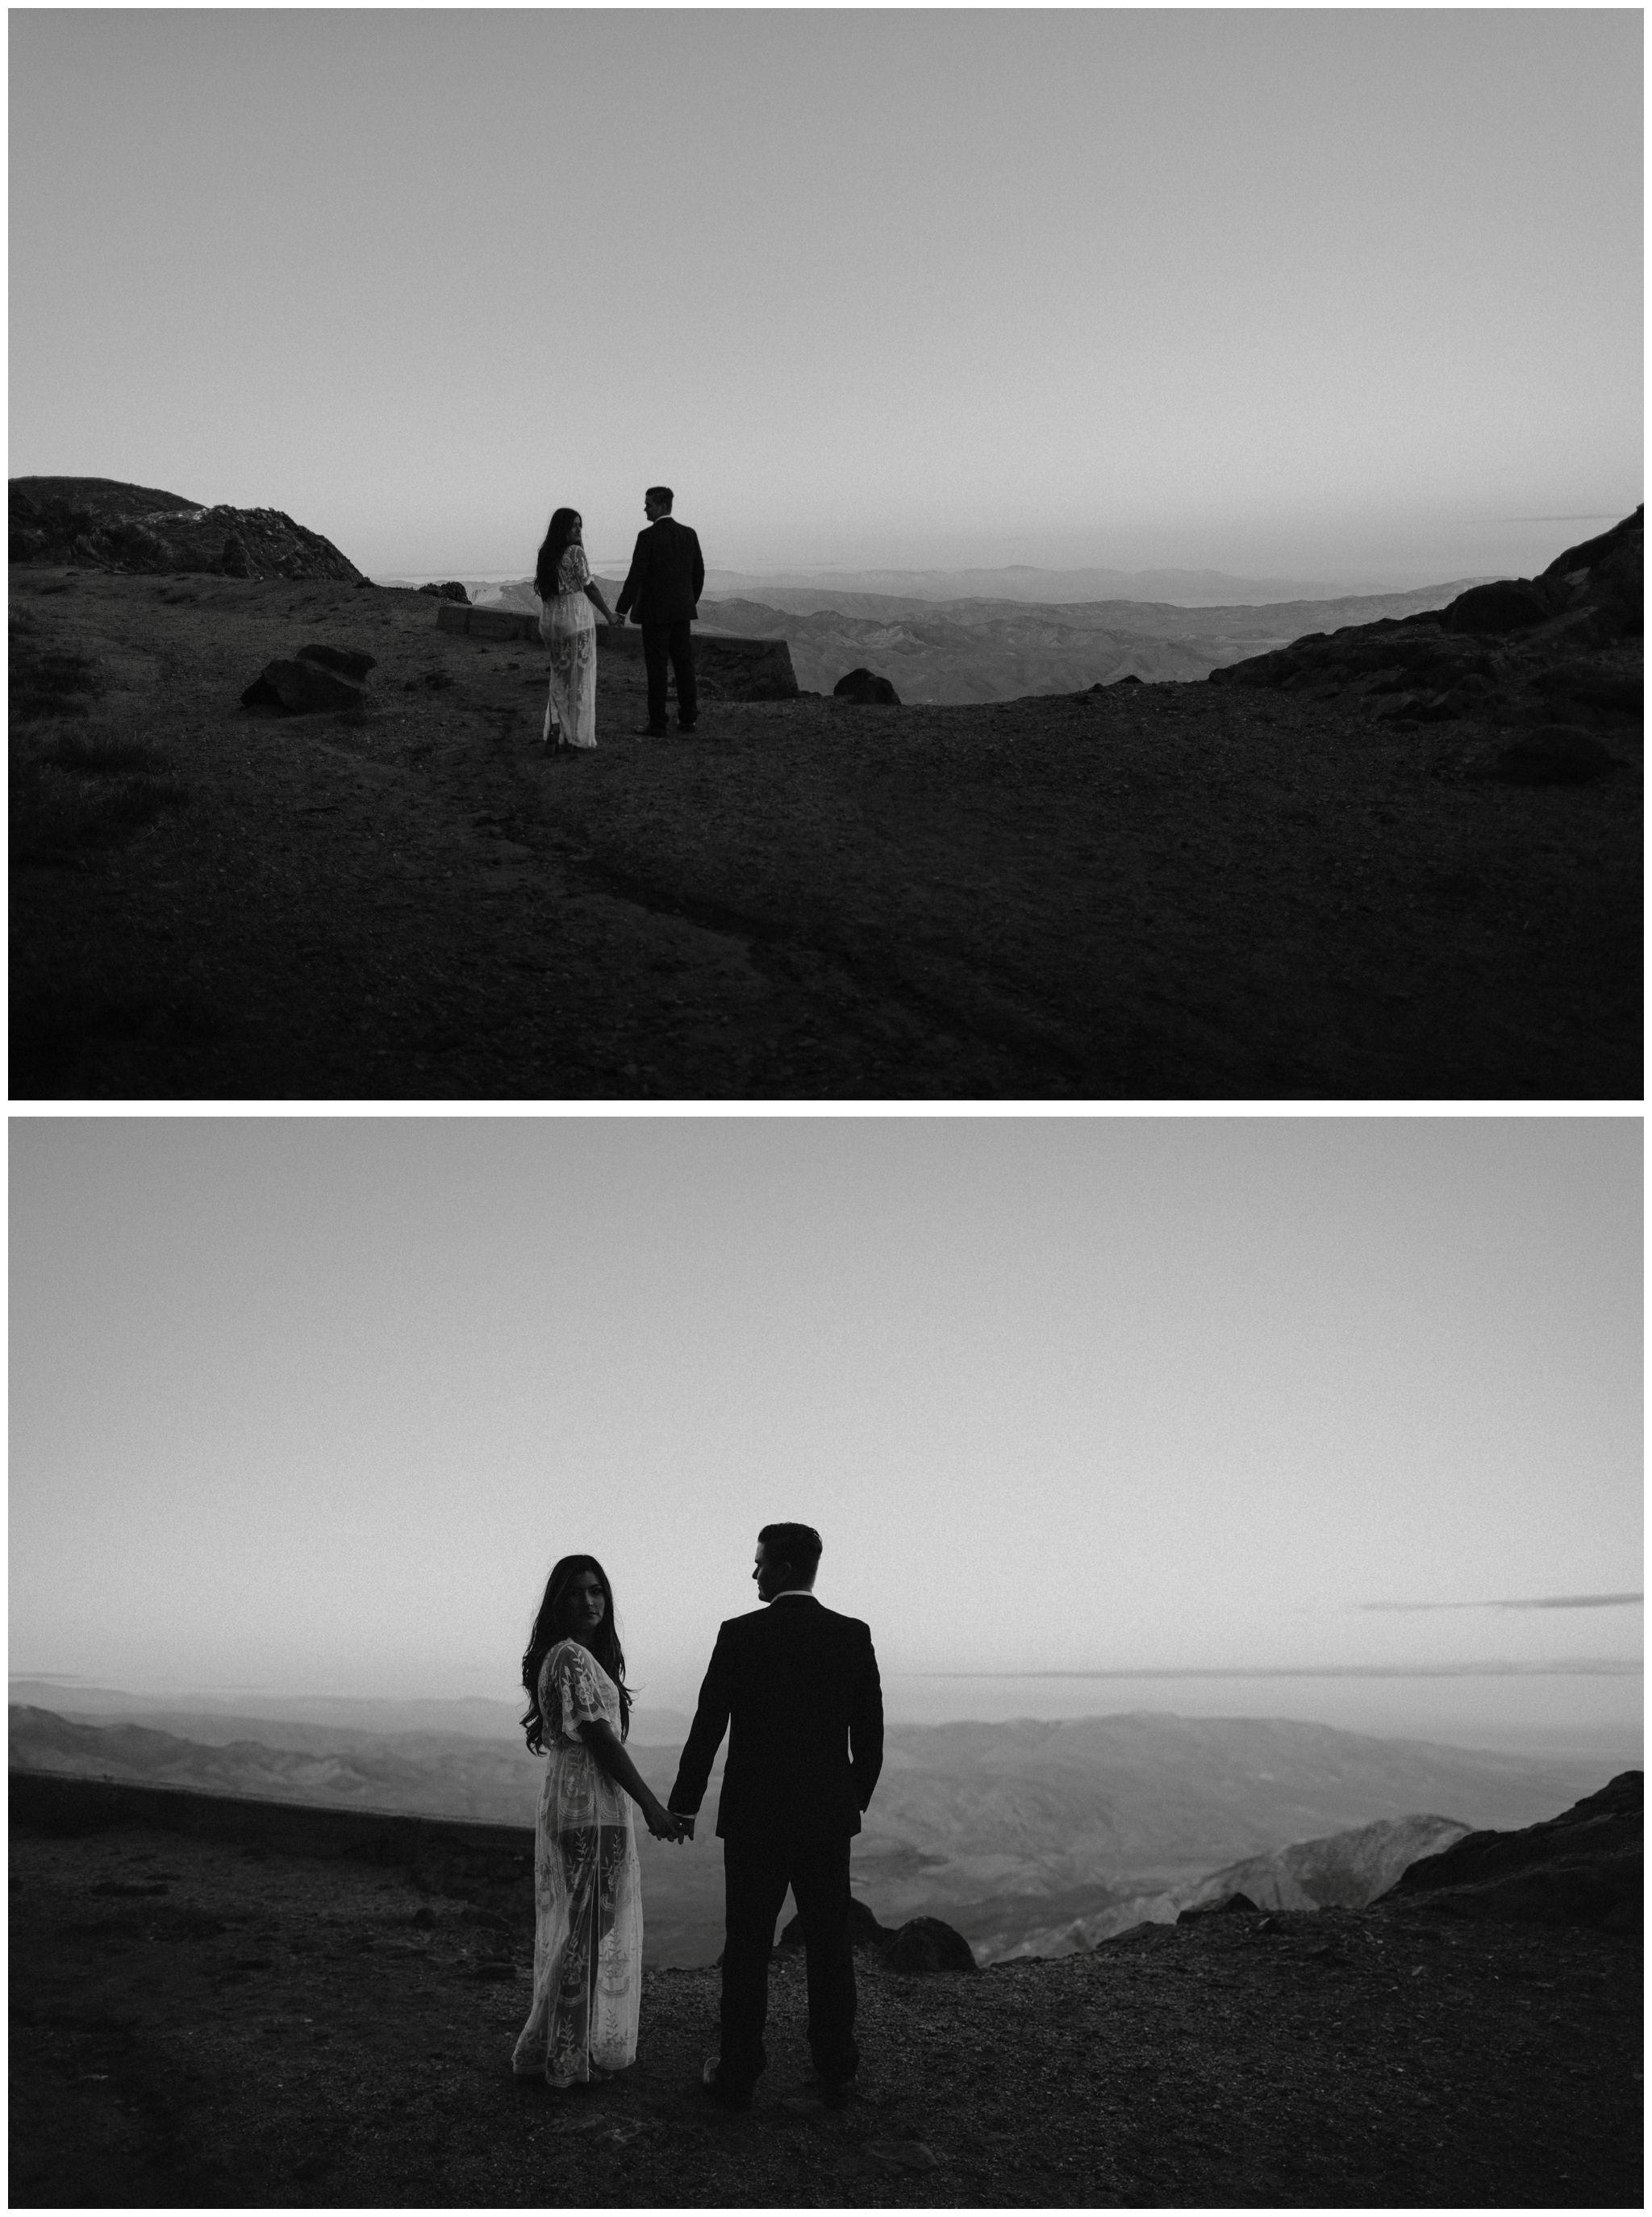 Mount_Laguna_Engagement_The_Singlers_0038.jpg